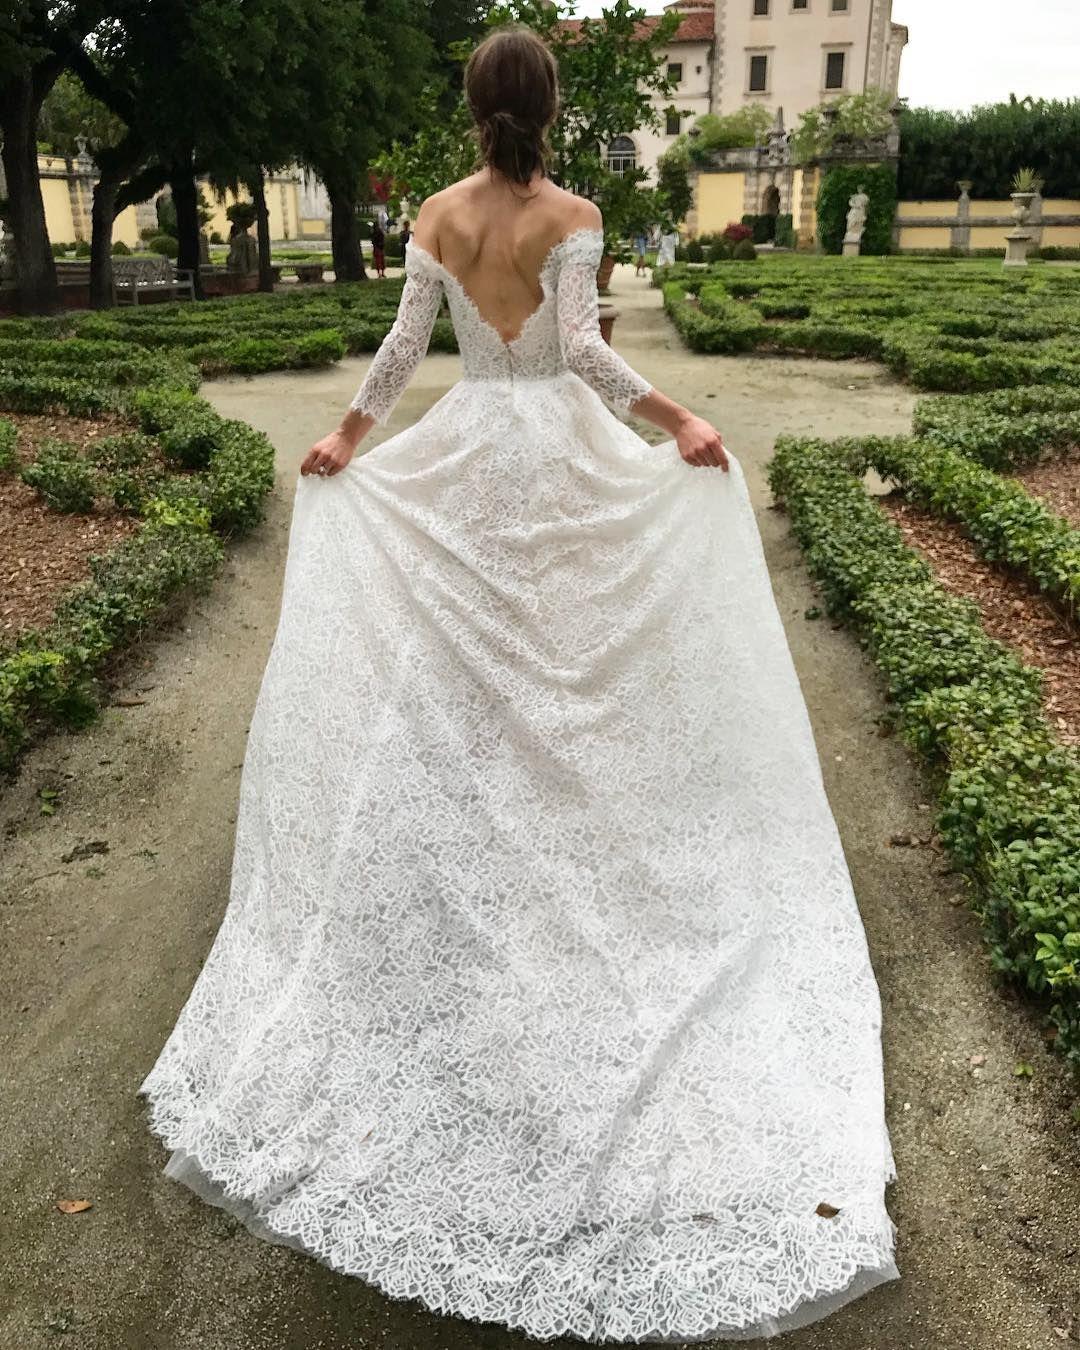 Monique Lhuillier Bride On Instagram Running Into The Weekend